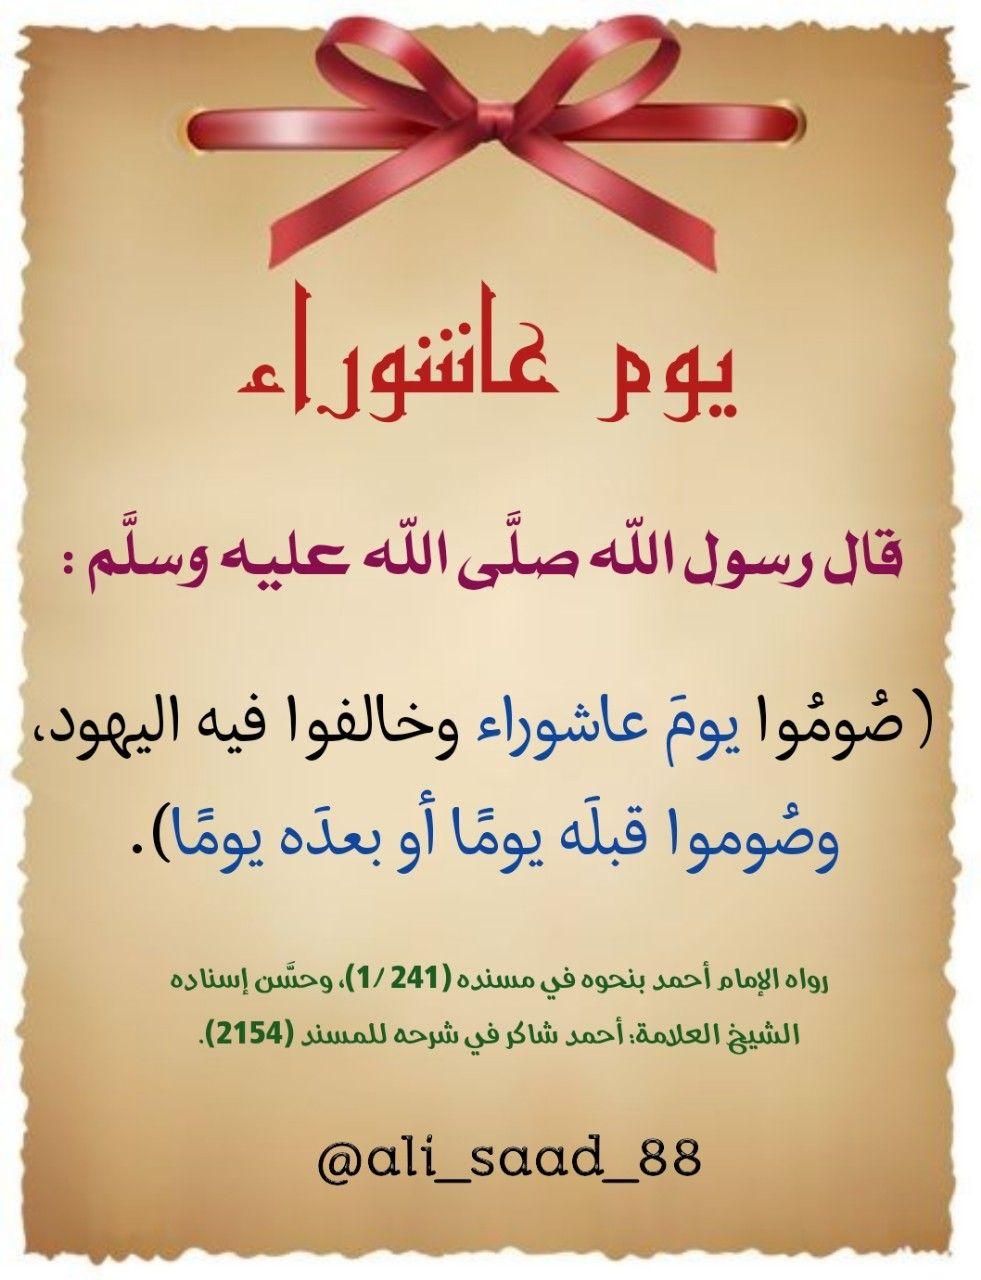 صيام يوم عاشوراء Arabic Calligraphy